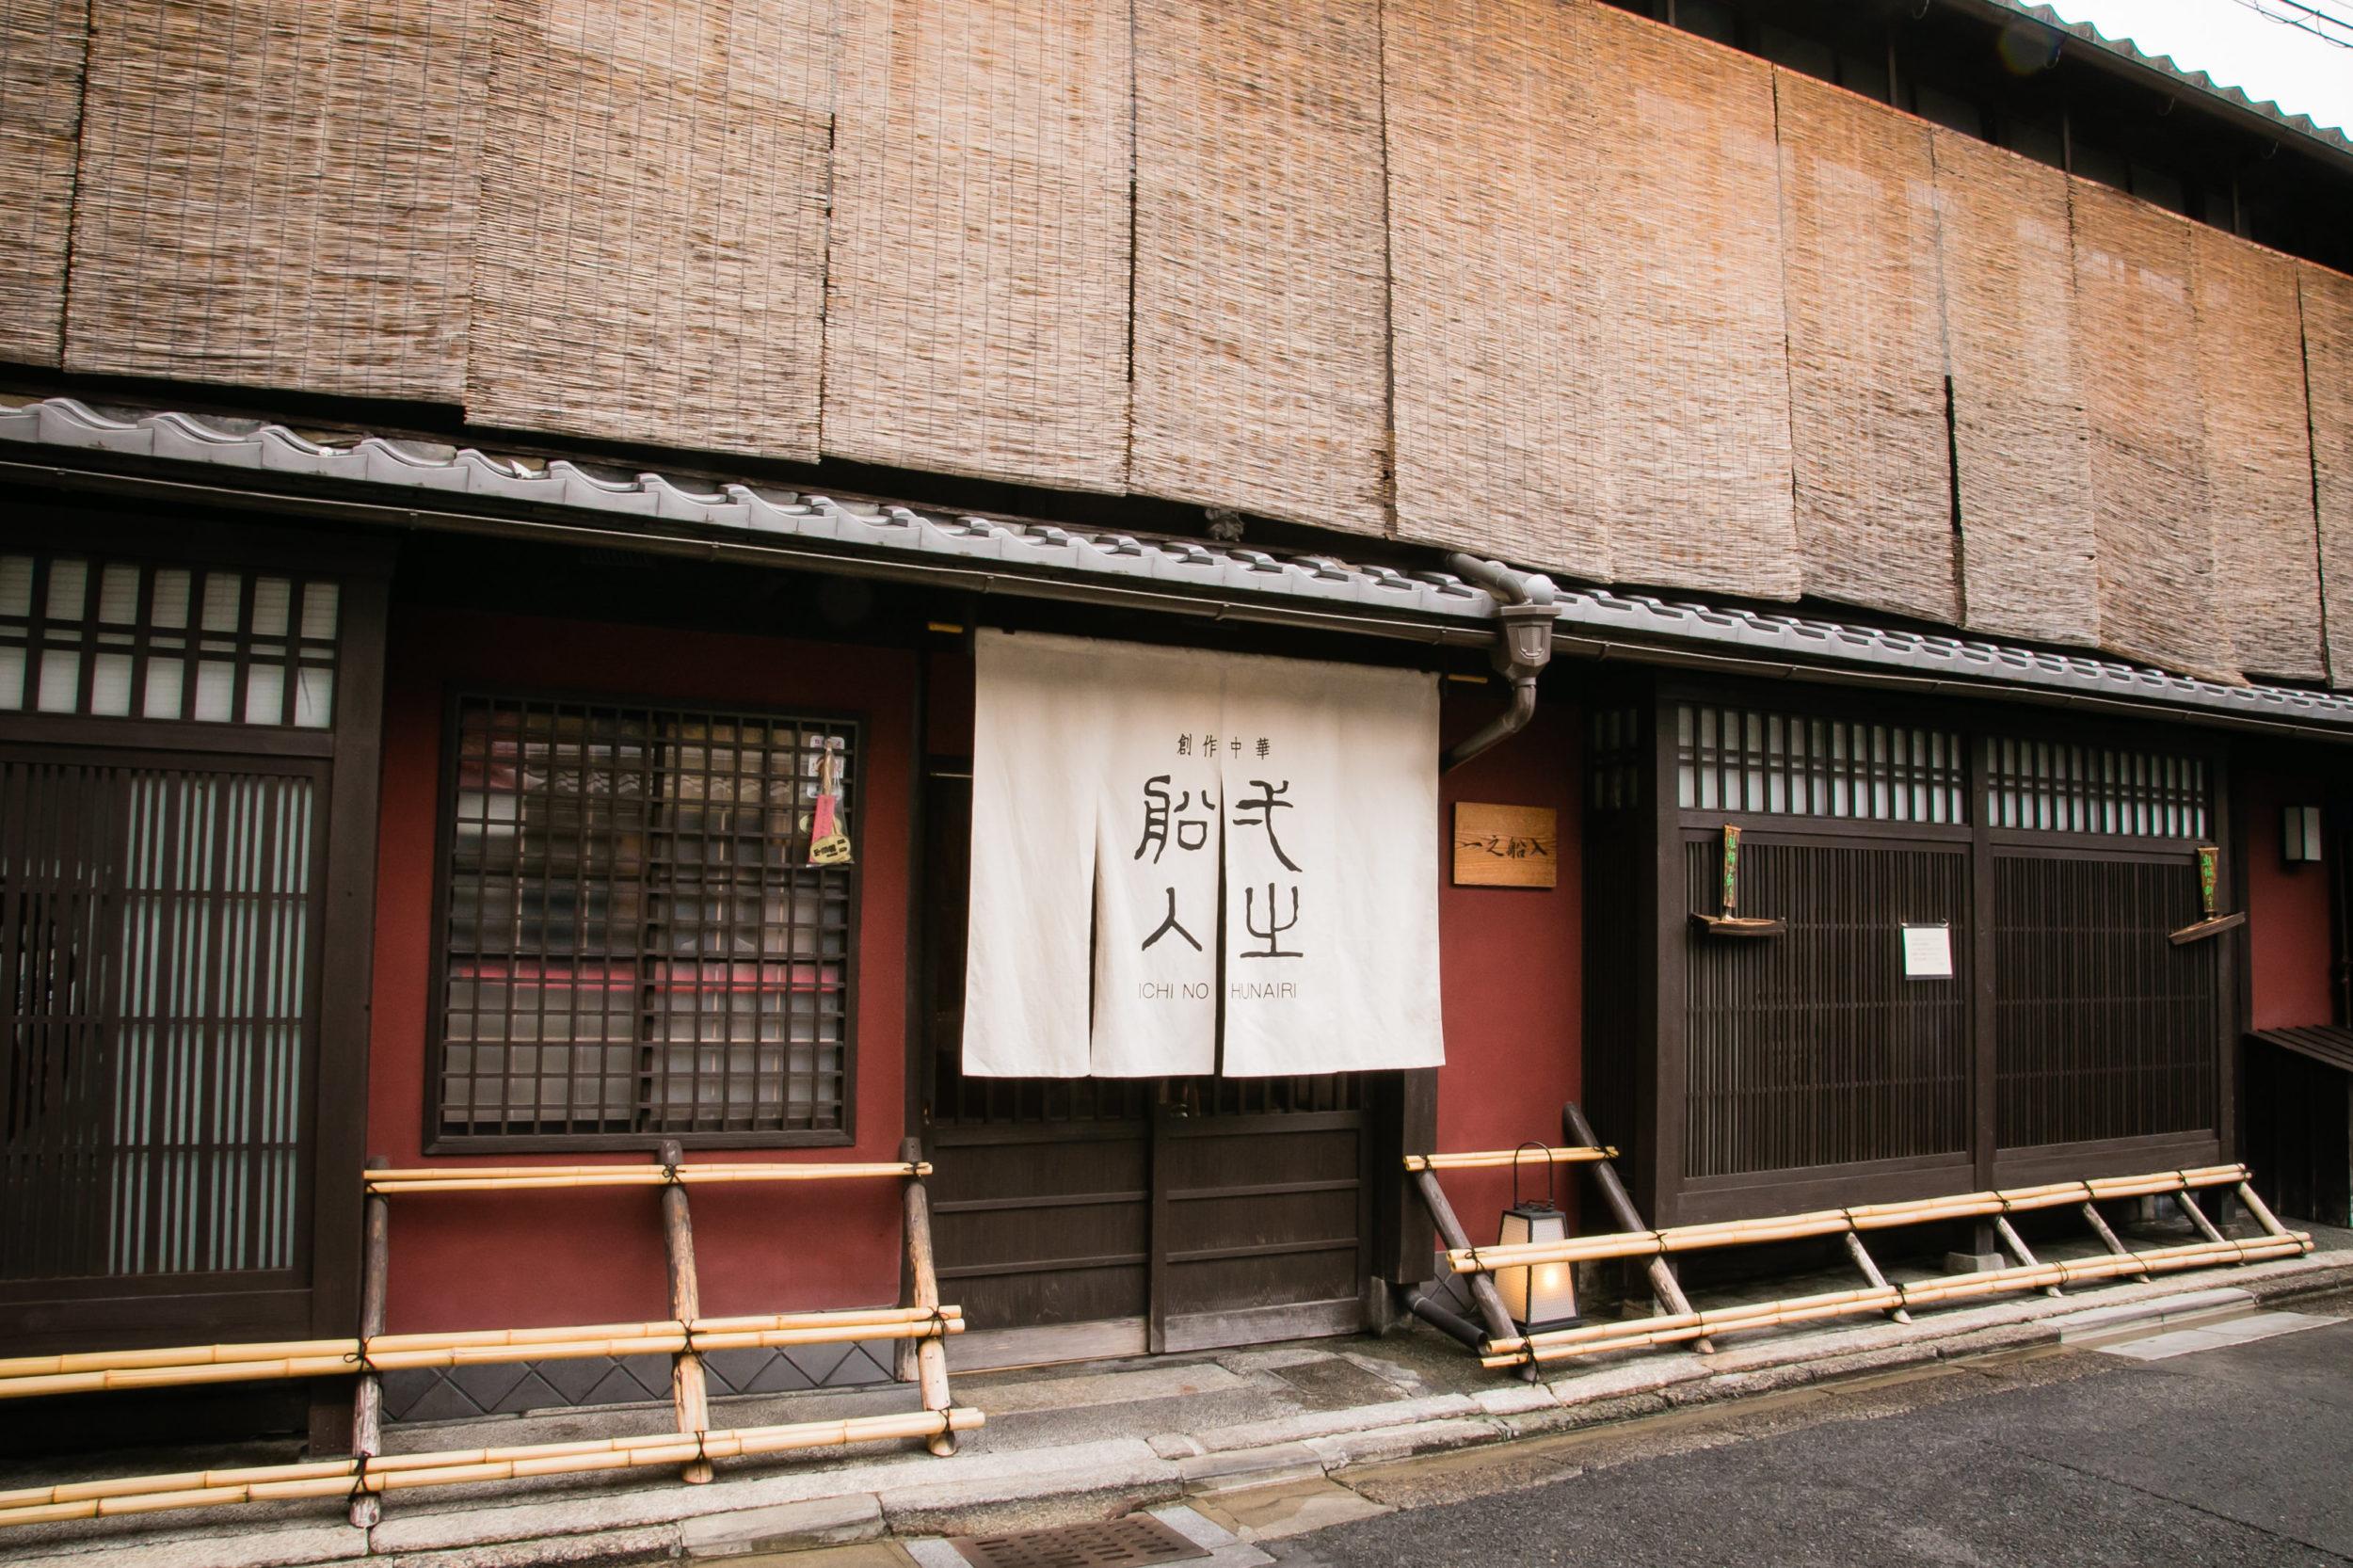 Ichi No Funairi appearance